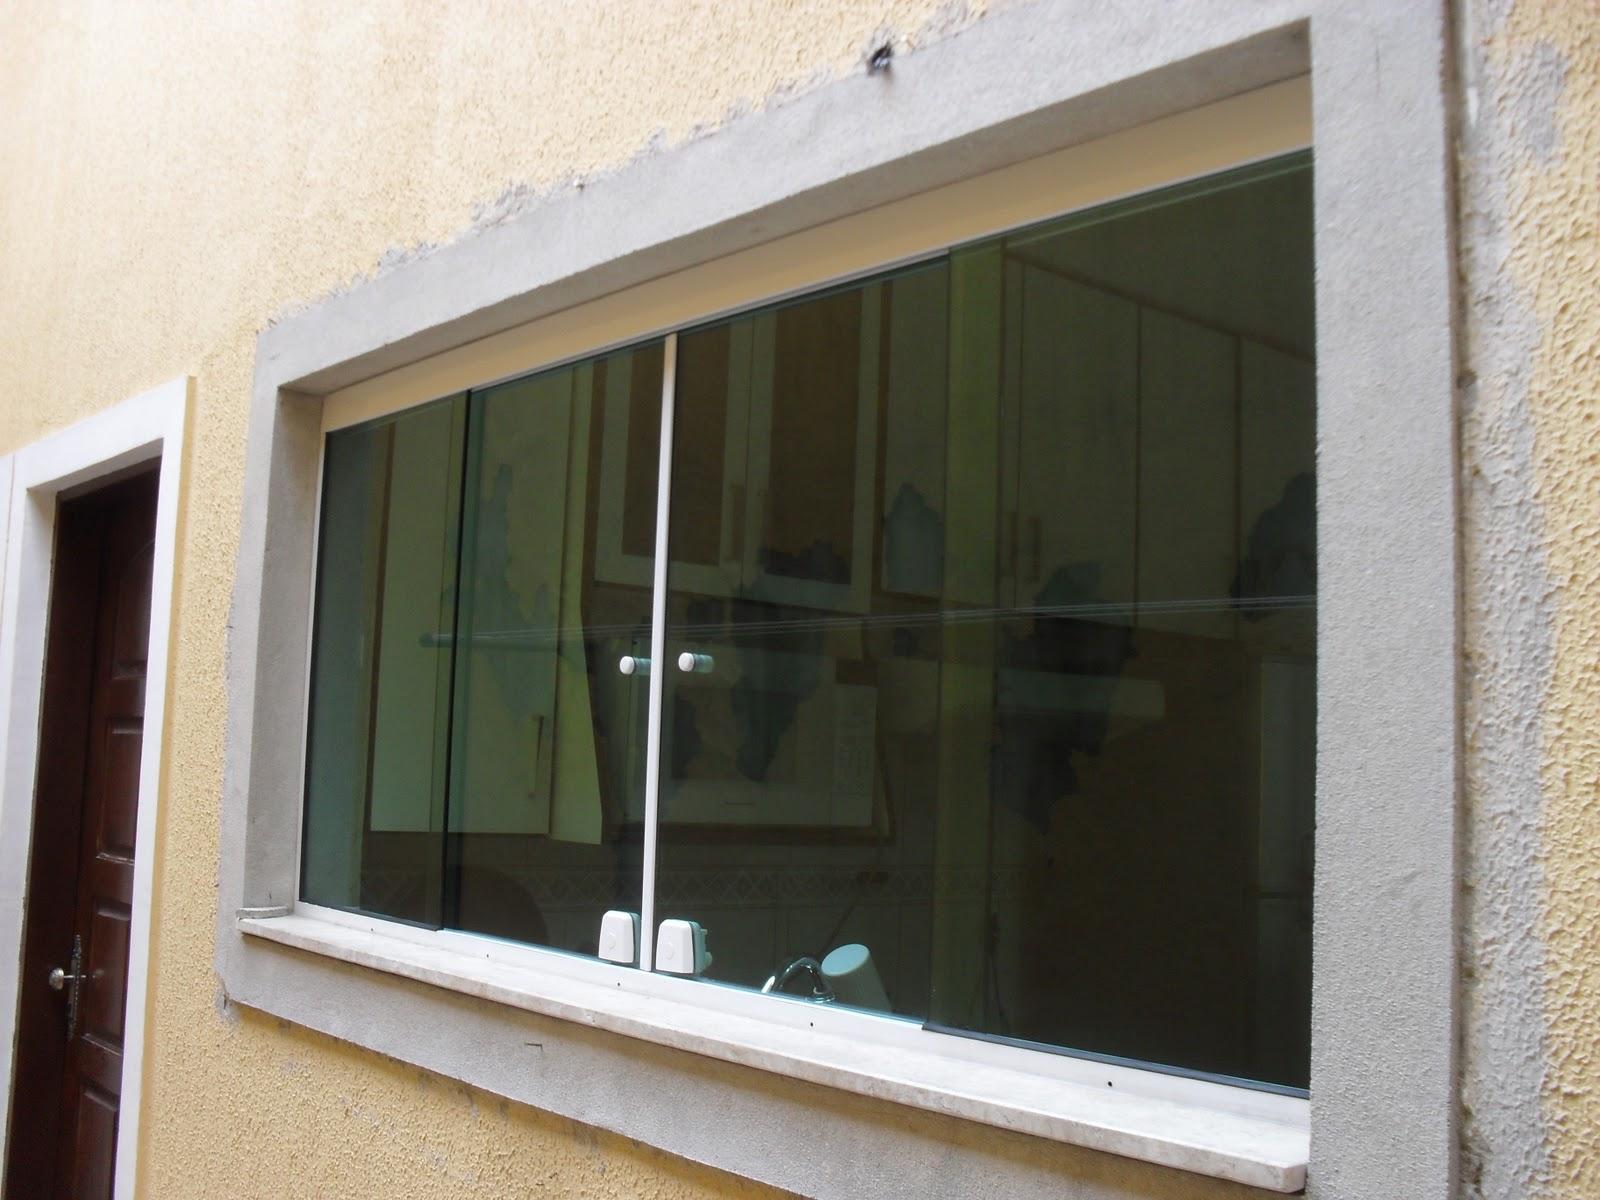 #856D46 Vidro Temperado Blindex03 Vidros Temperados Blindex HD Walls Find  1574 Vidros Em Bh Janelas